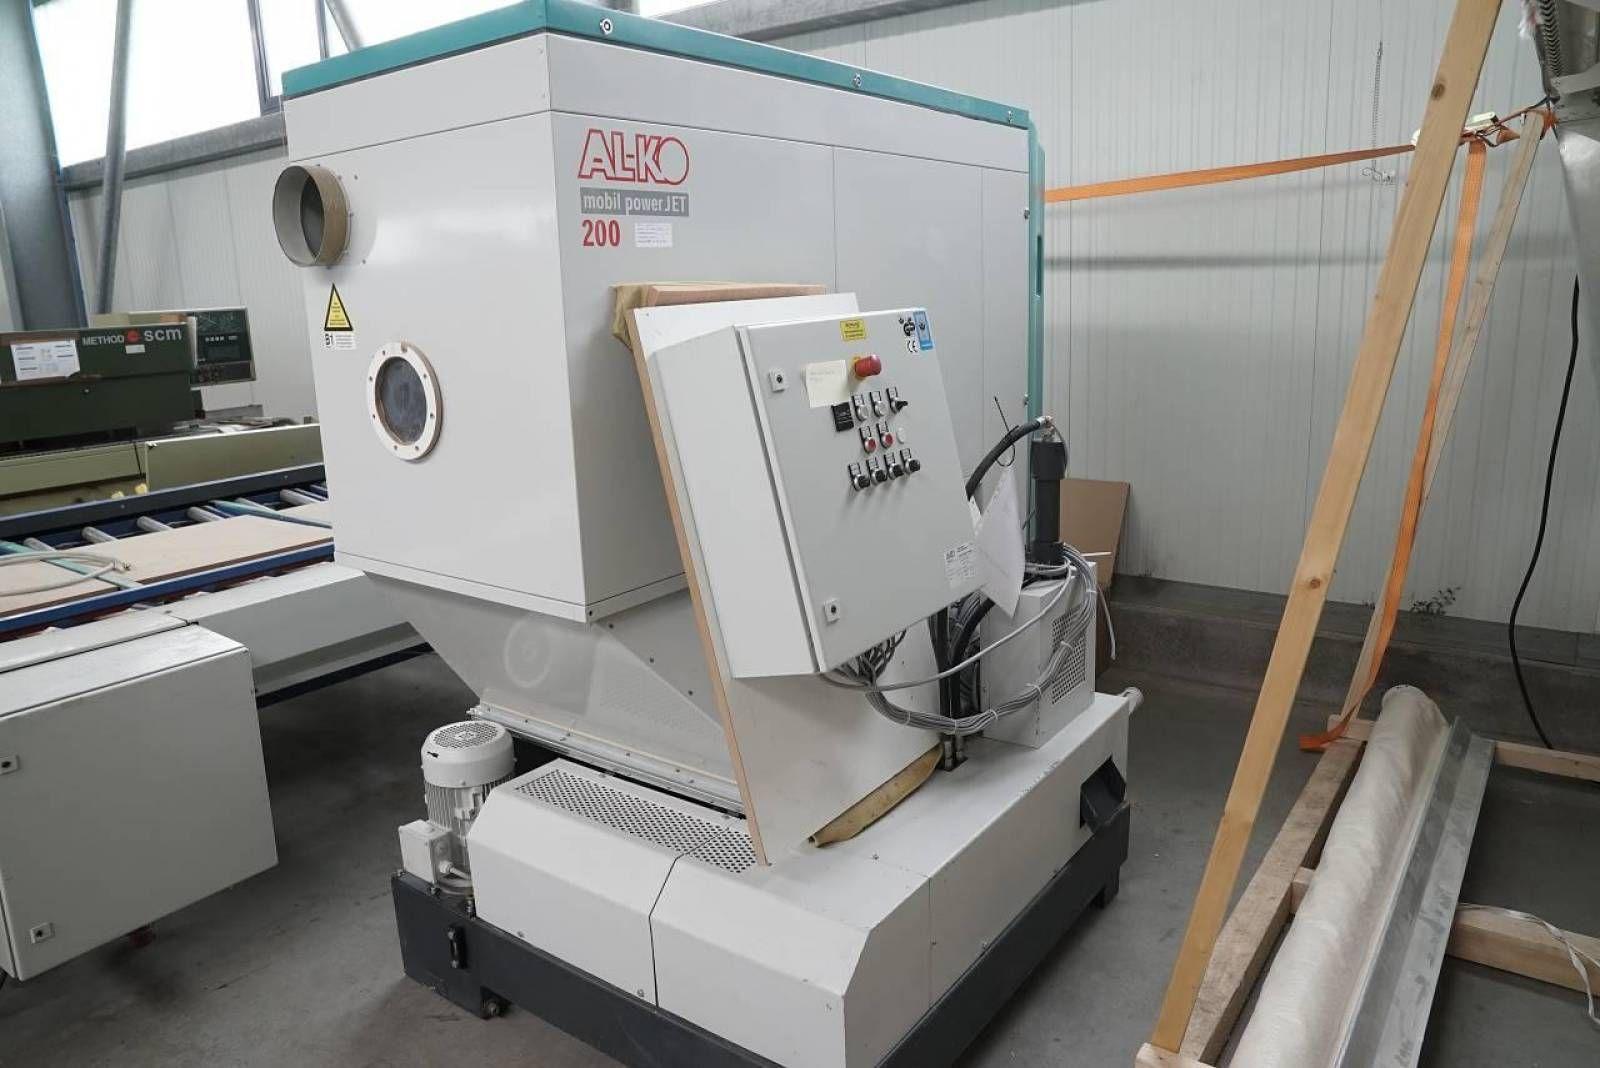 Filteranlage mit Brikettpresse AL-KO MOBIL POWER JET 200 + AL-KO APC 30 S AL-KO MOBIL POWER JET 200